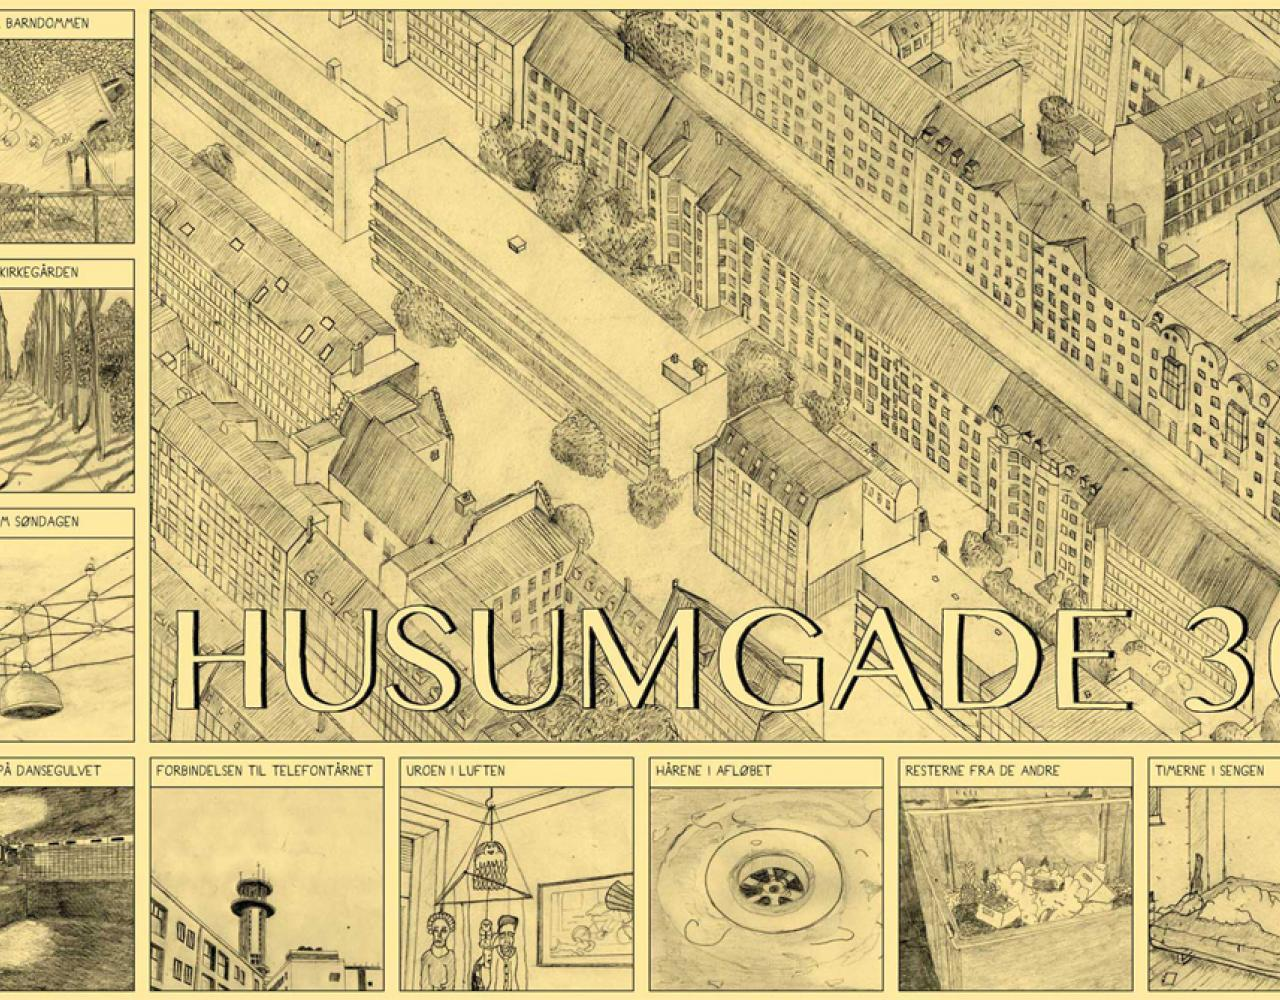 Bue B Husumgade 30 plakat